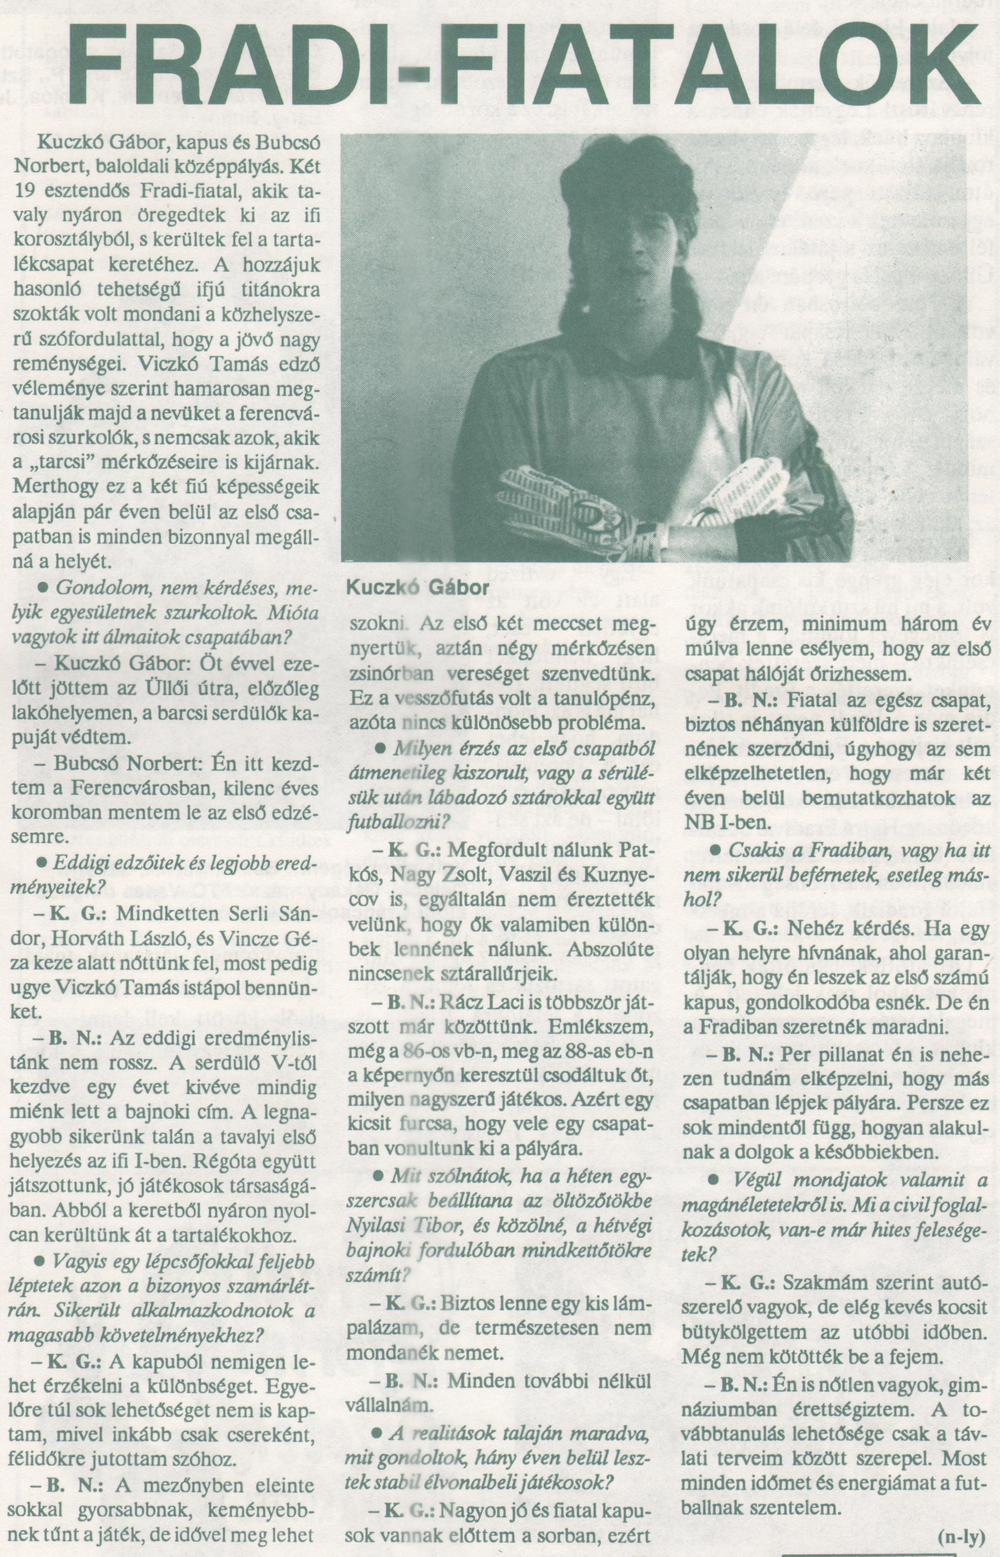 TFU_19920315_FU-Zs_003 - 0009-2